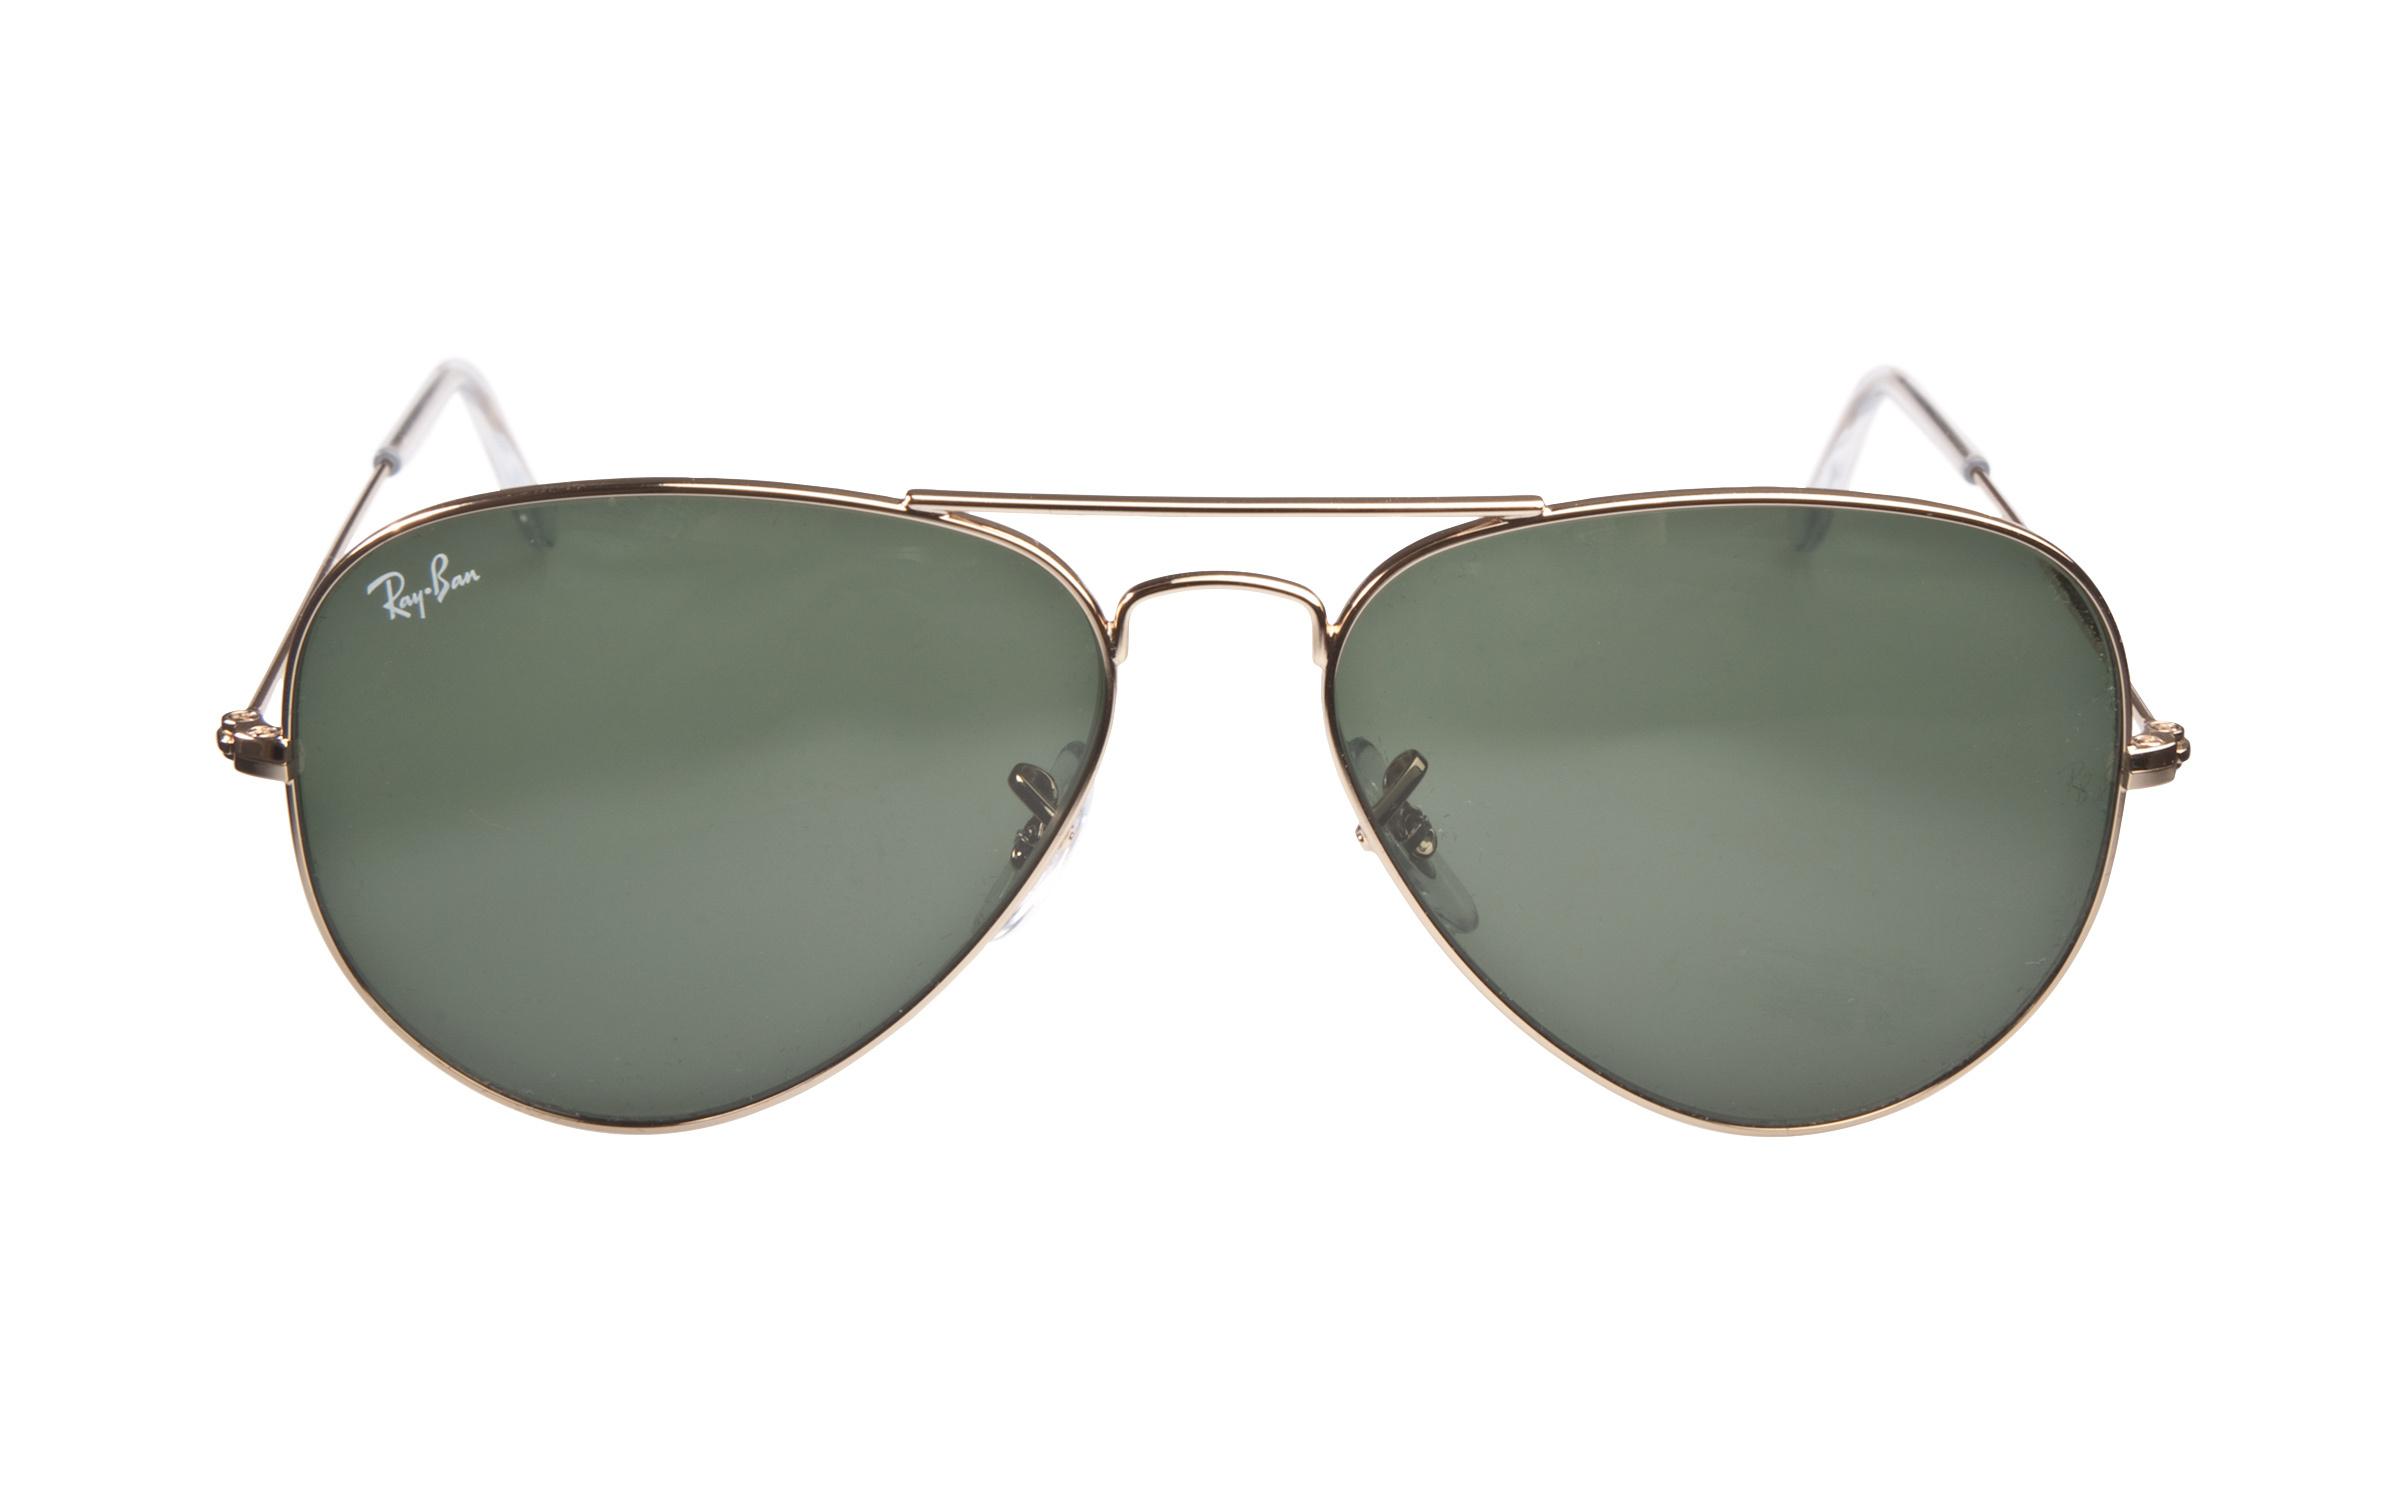 1ff893b430 Ray Ban Clubmaster Sunglasses Rb 3016 Vs Rb 2156 « Heritage Malta